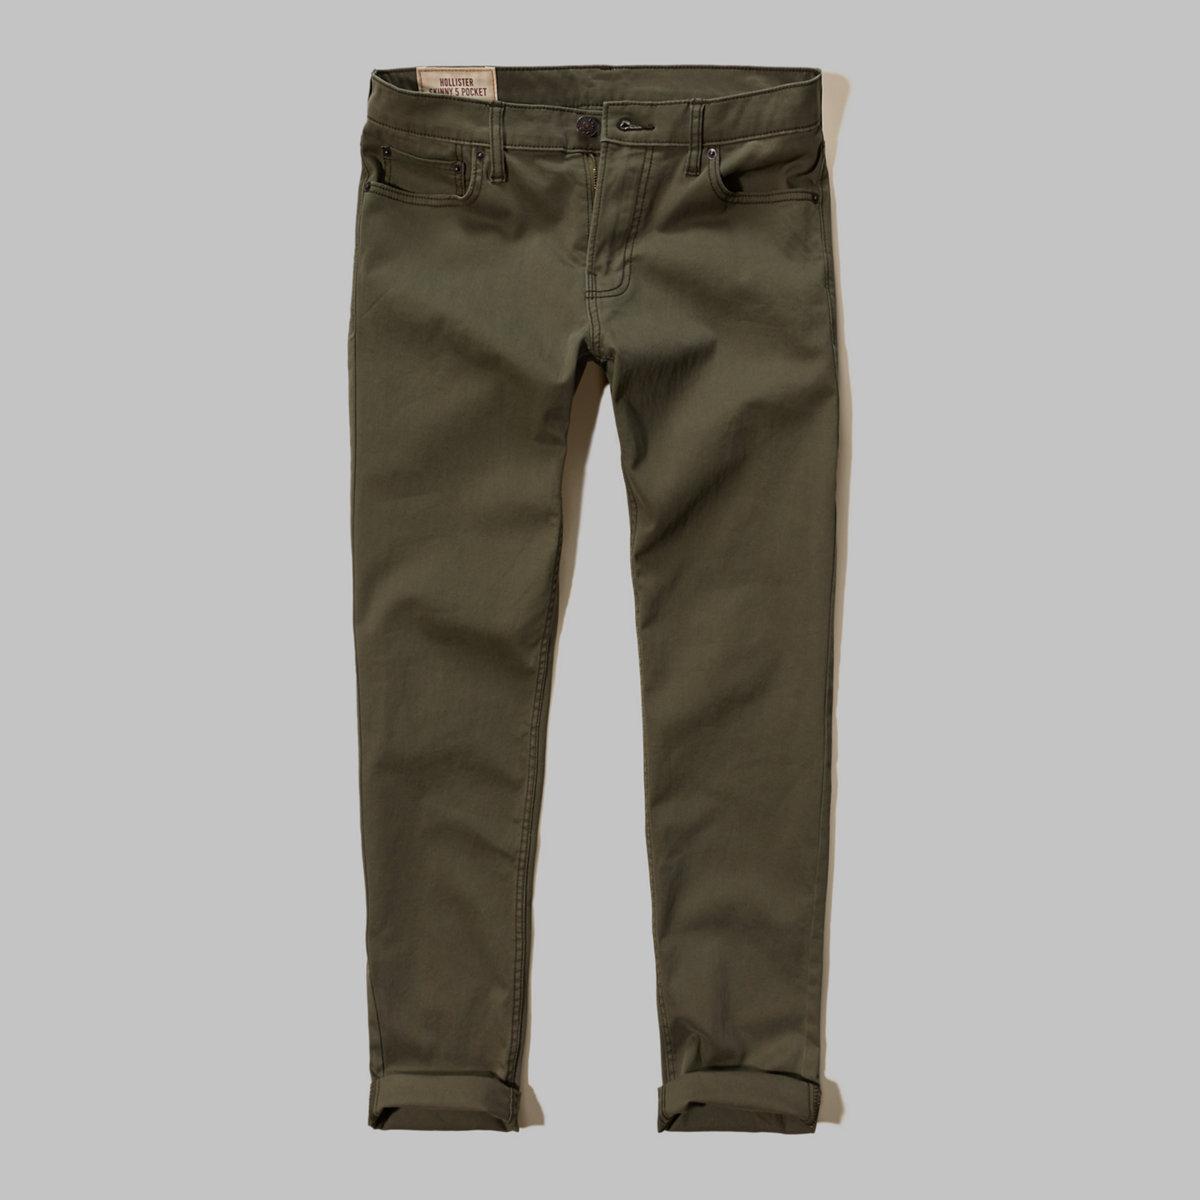 Hollister Skinny 5 Pocket Zipper Fly Pants